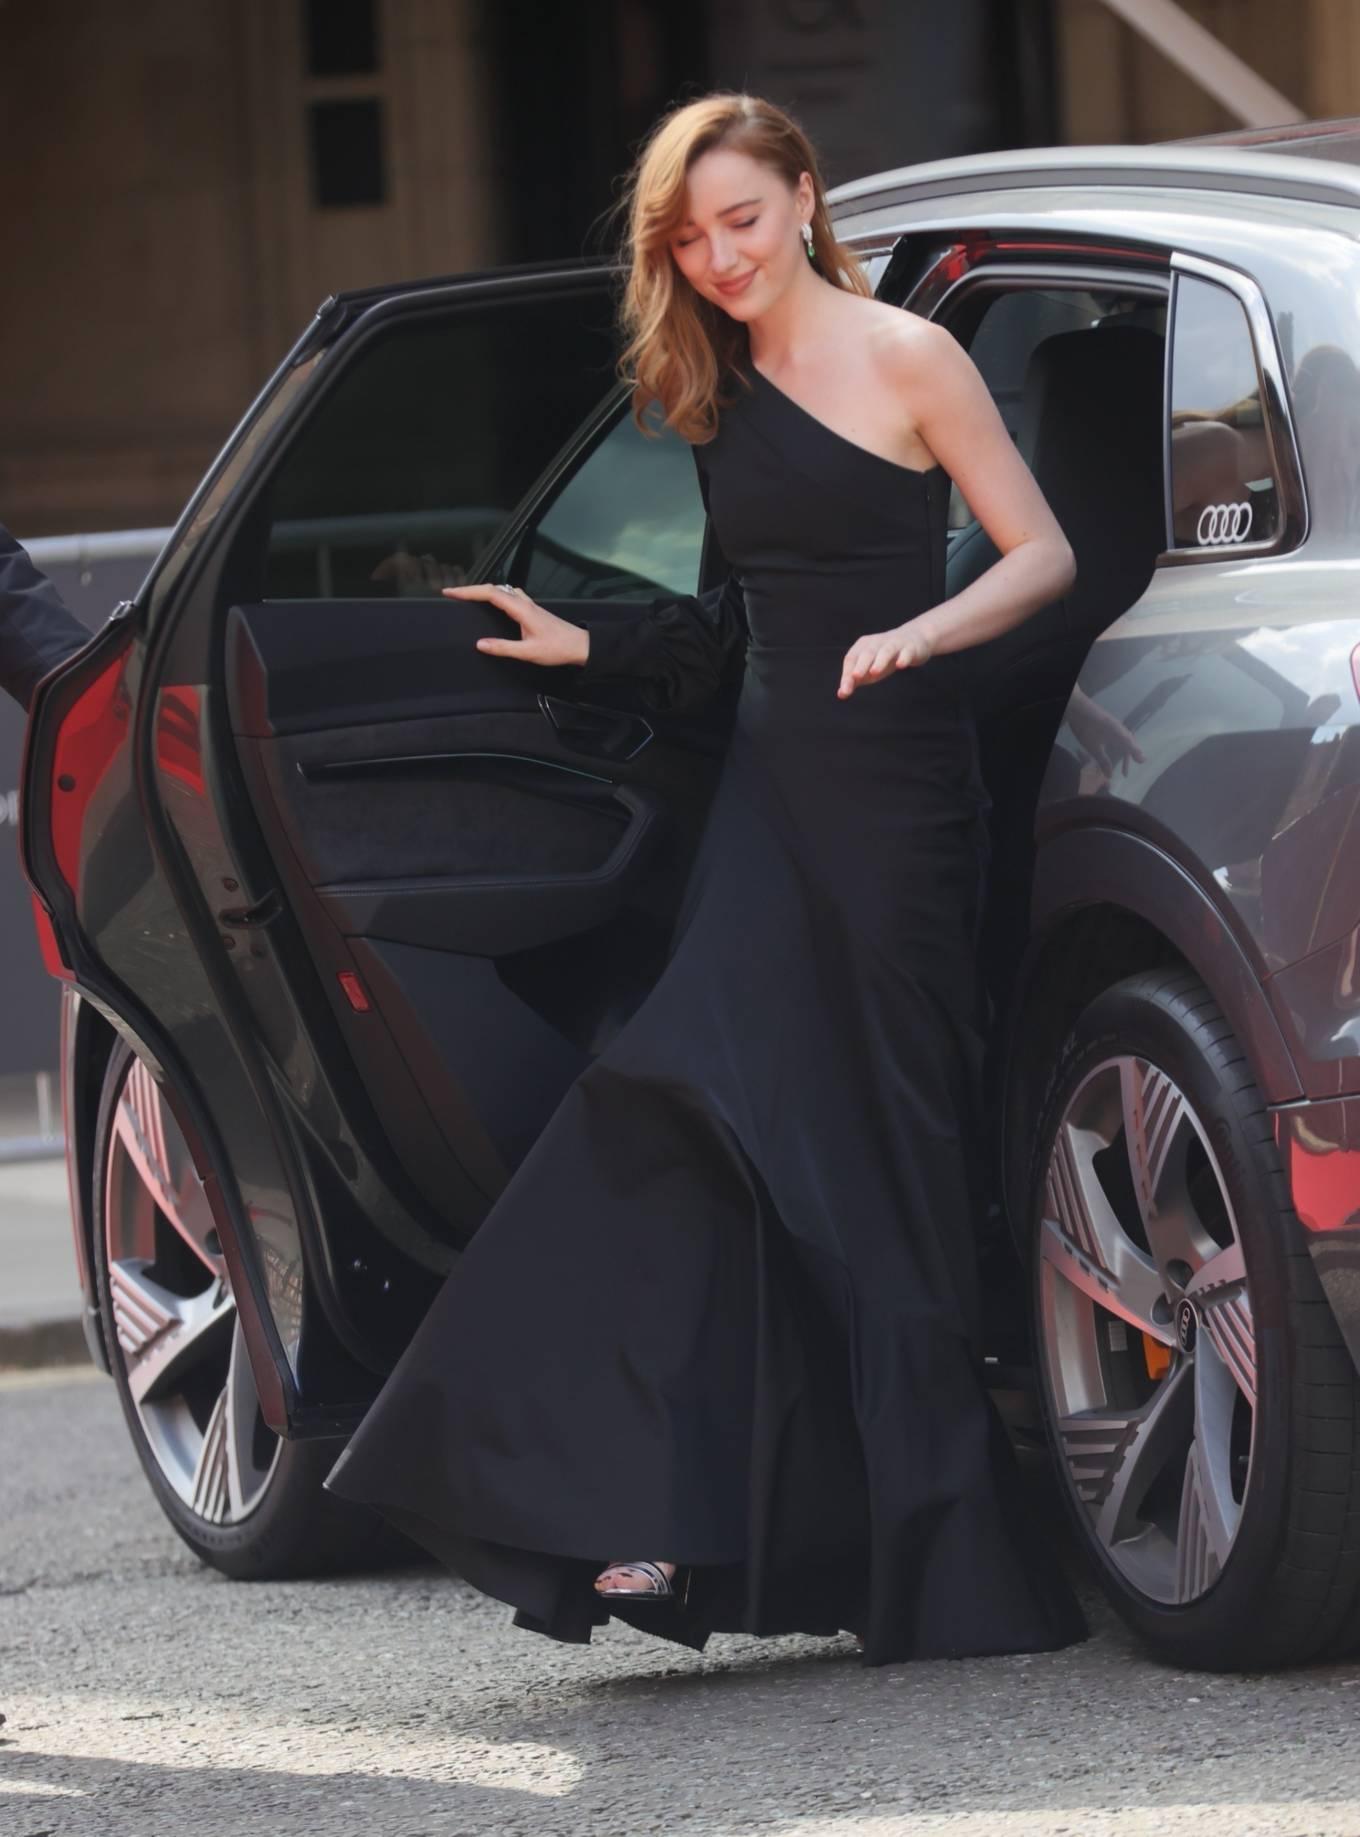 Phoebe Dynevor 2021 : Phoebe Dynevor – at the Royal Albert Hall for 2021 British Academy Film Awards in London-13